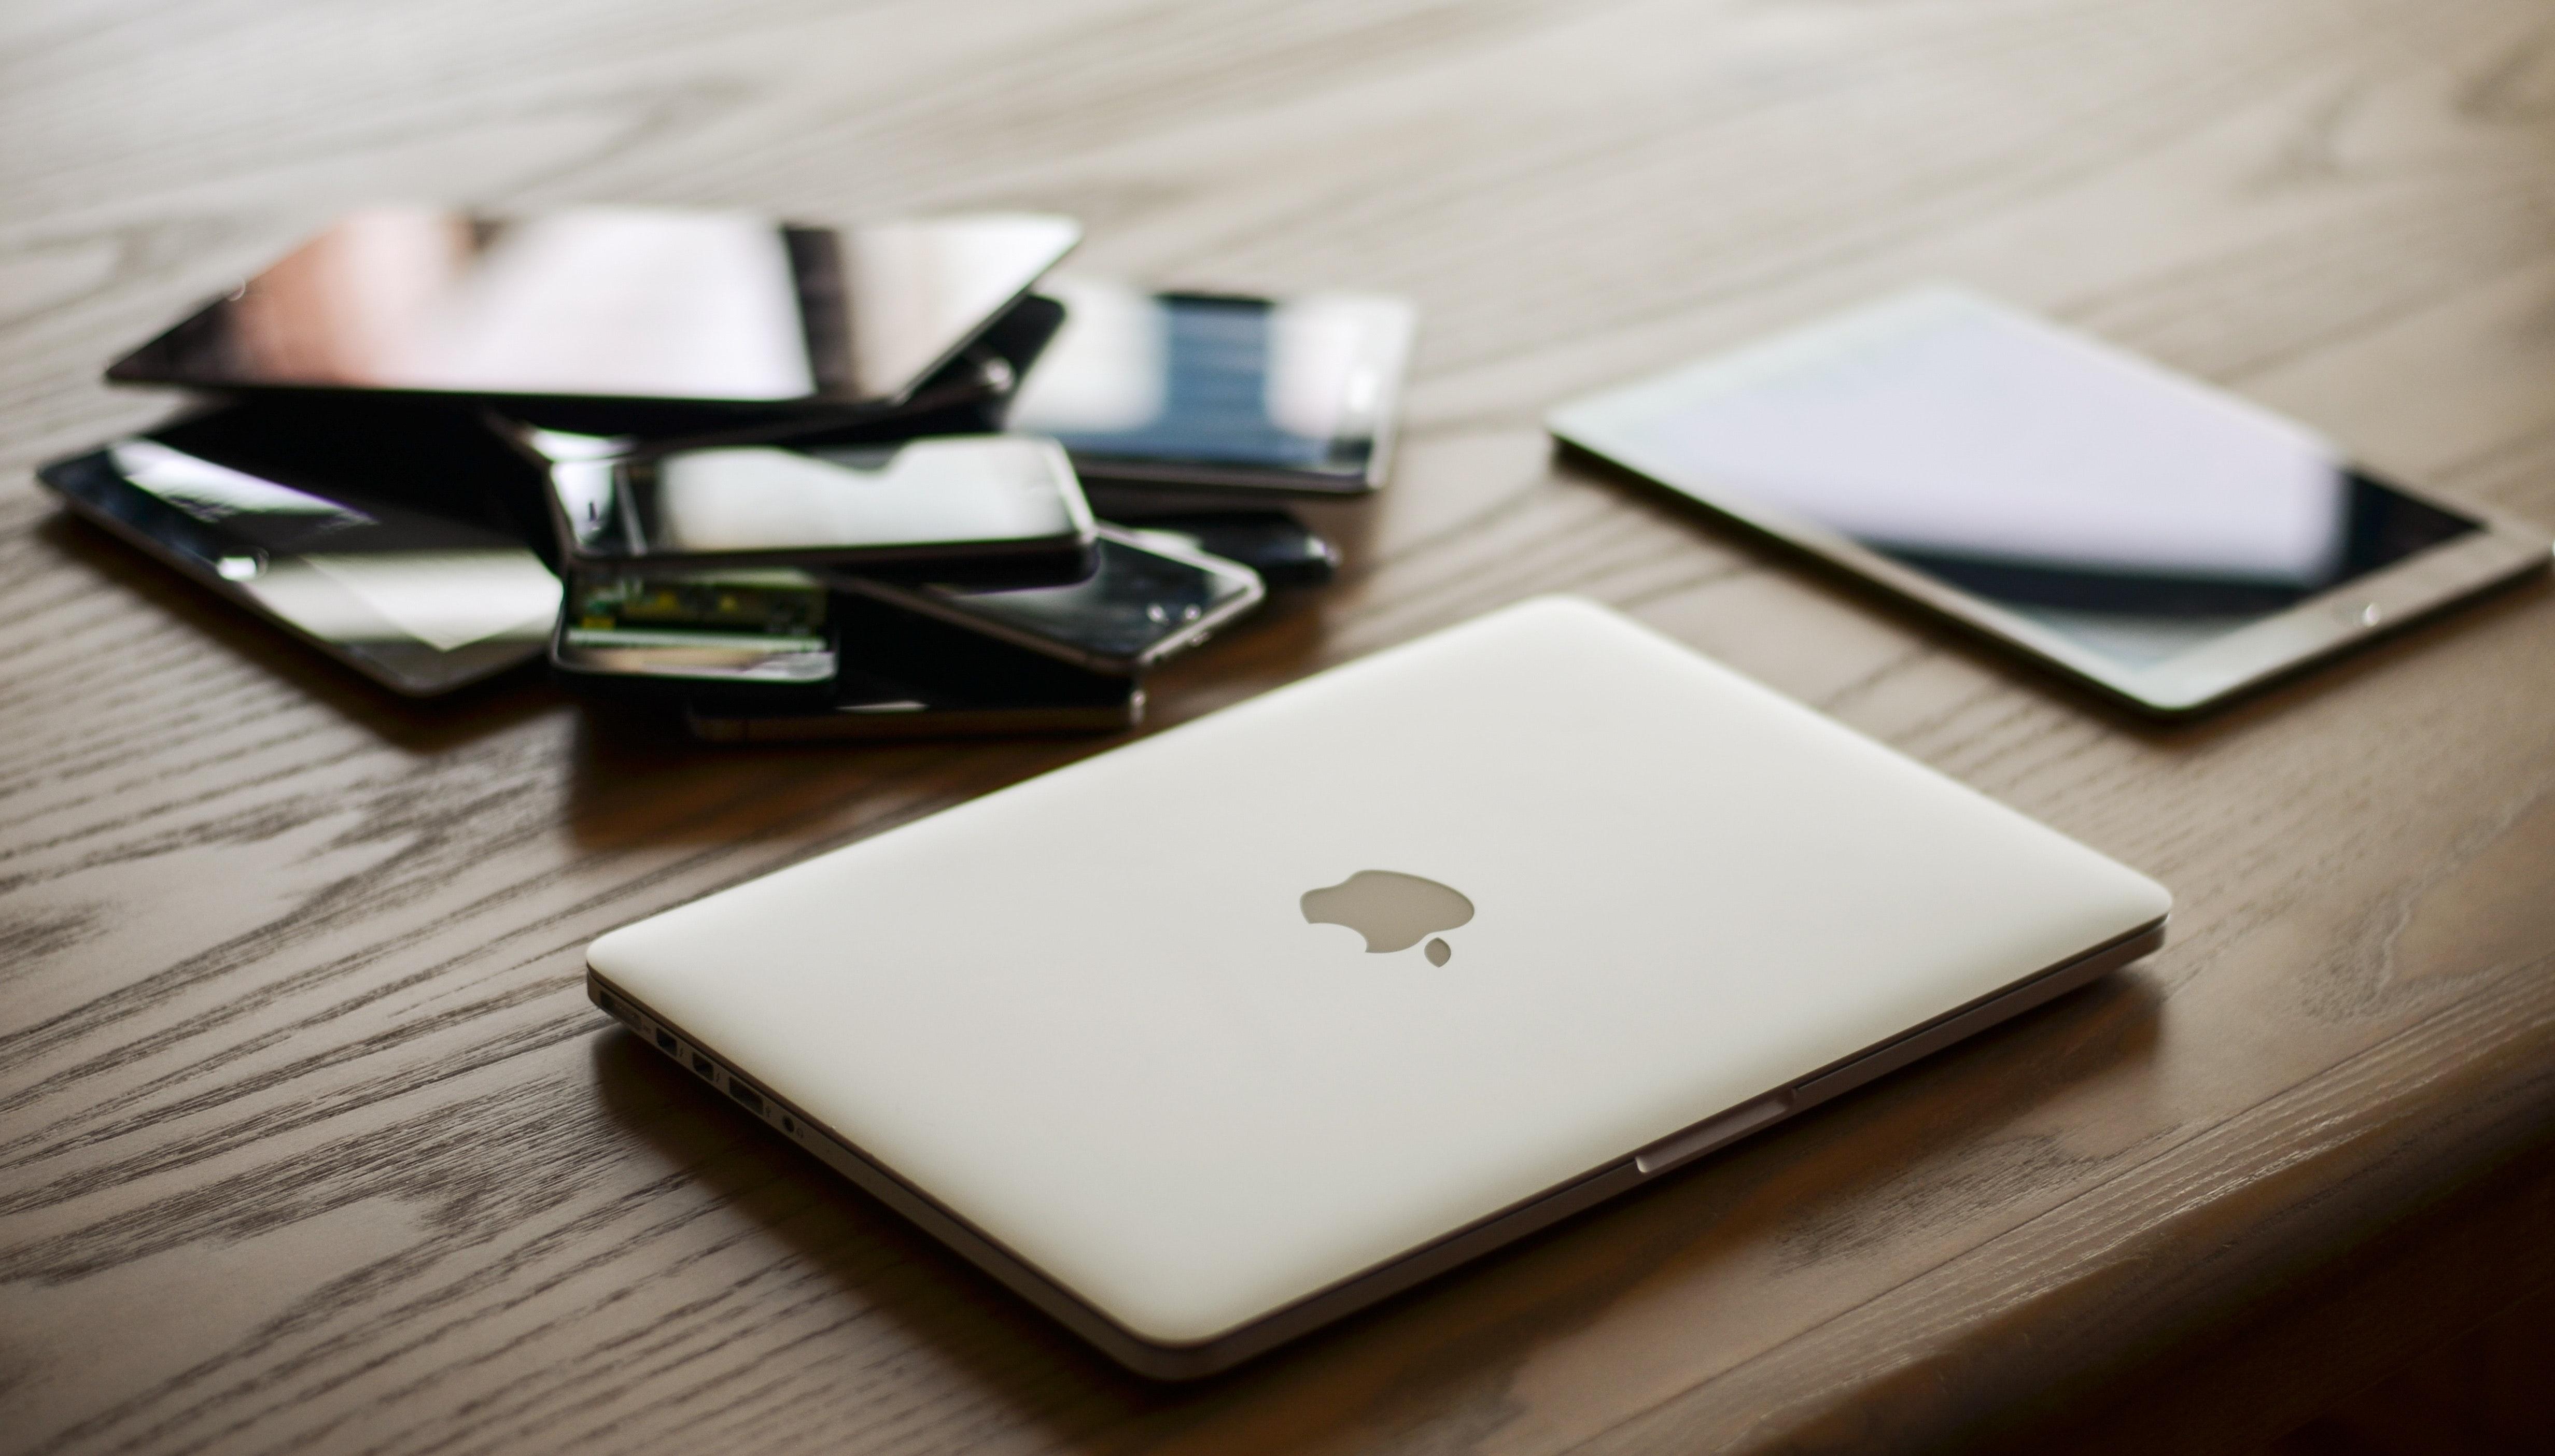 Macbook and ipad on desk photo